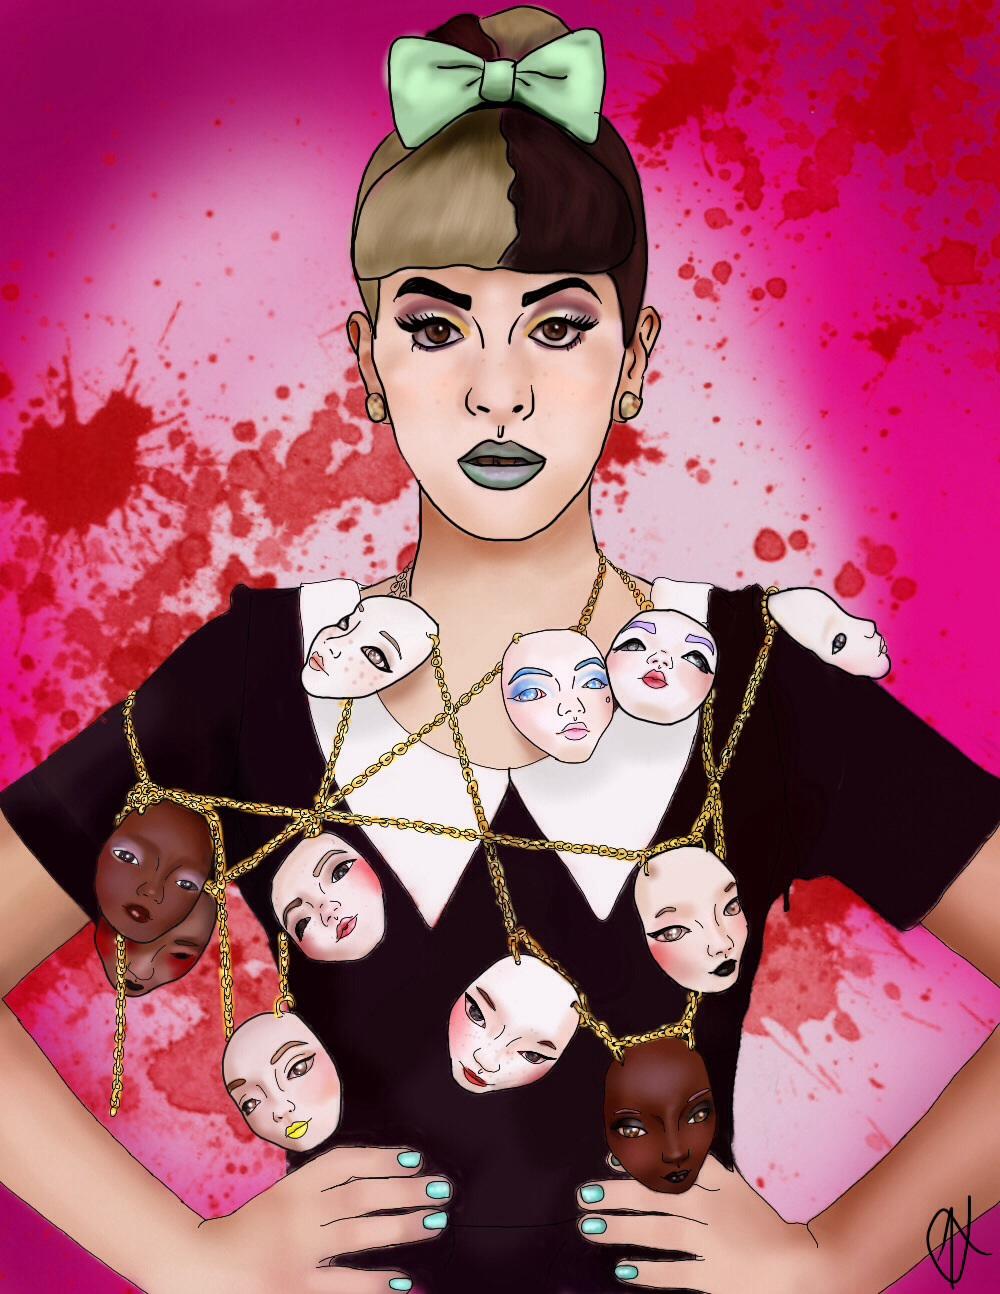 Melanie Martinez Dollhouse Drawing 51851 Usbdata